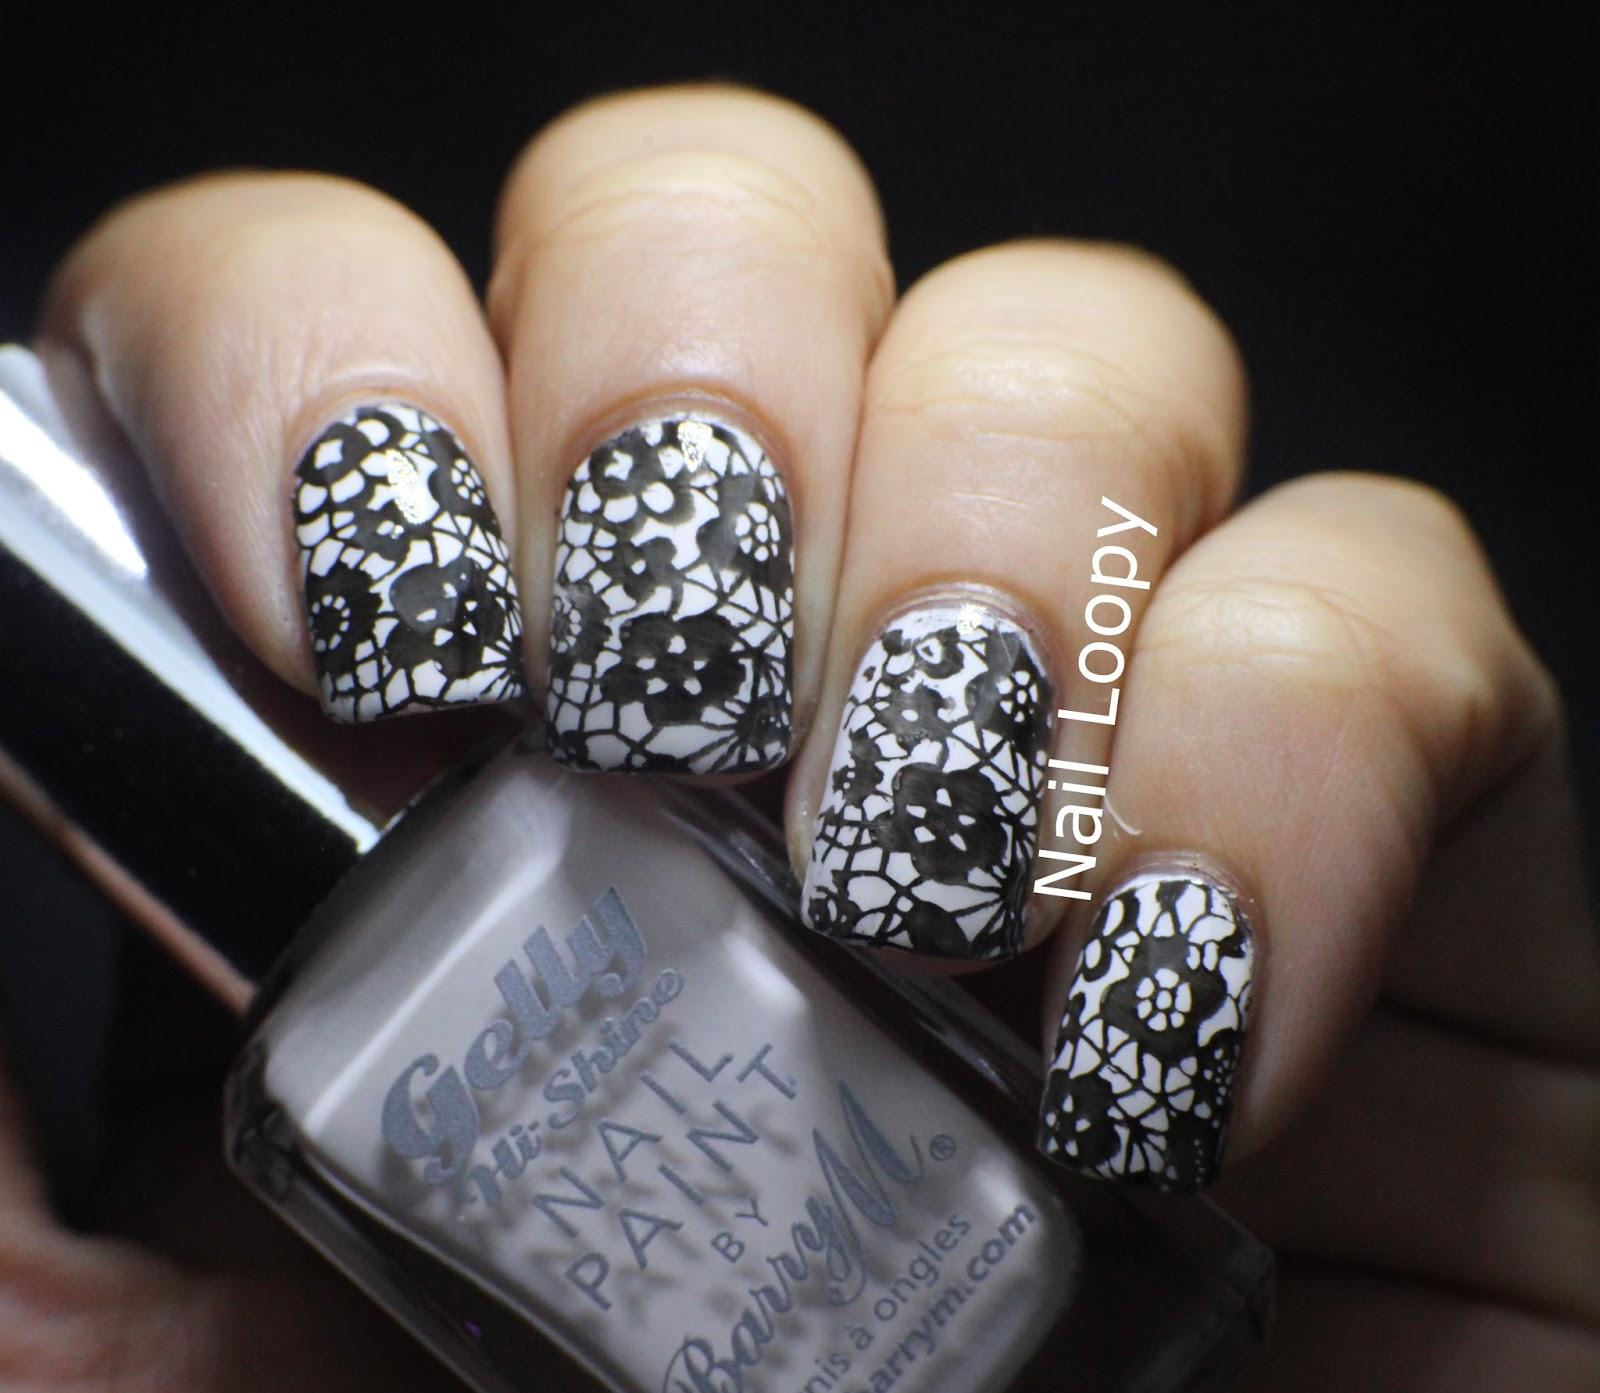 Lace nail designs!